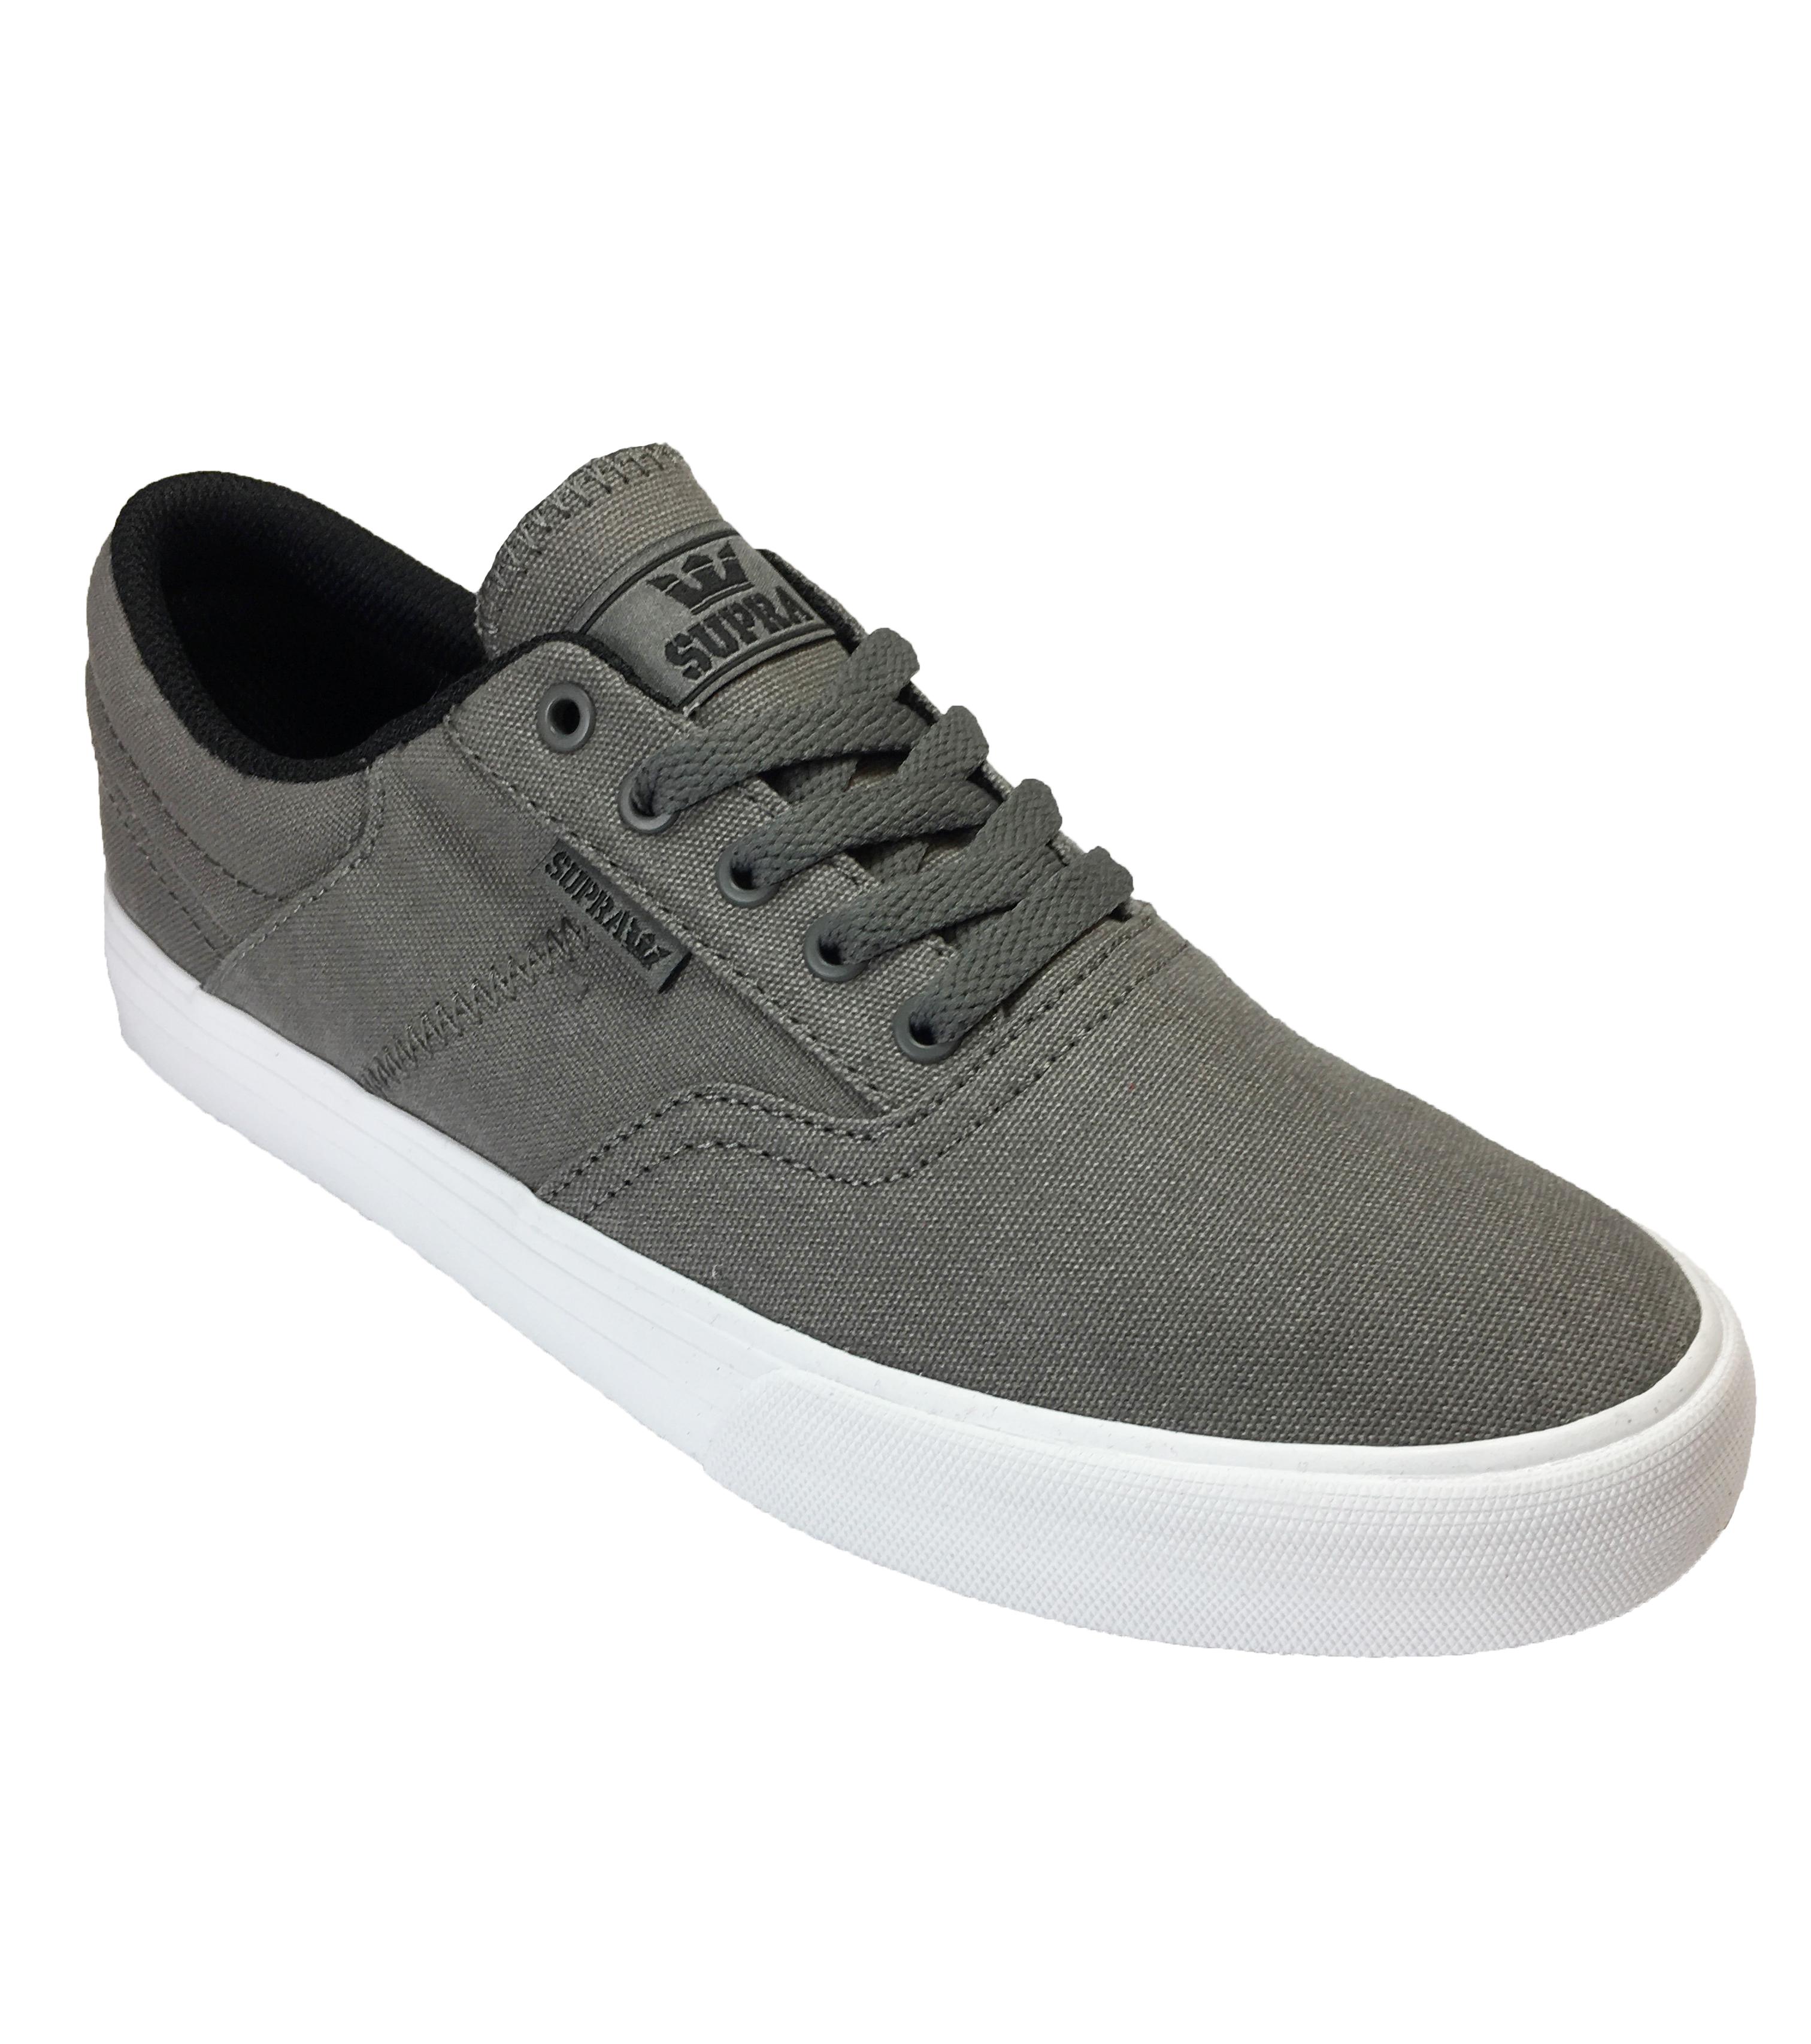 Details about SUPRA Cobalt Canvas Trainer Casual Sporty Gym Sneaker Shoe  Plimsole Grey White cdcf23d9bc99